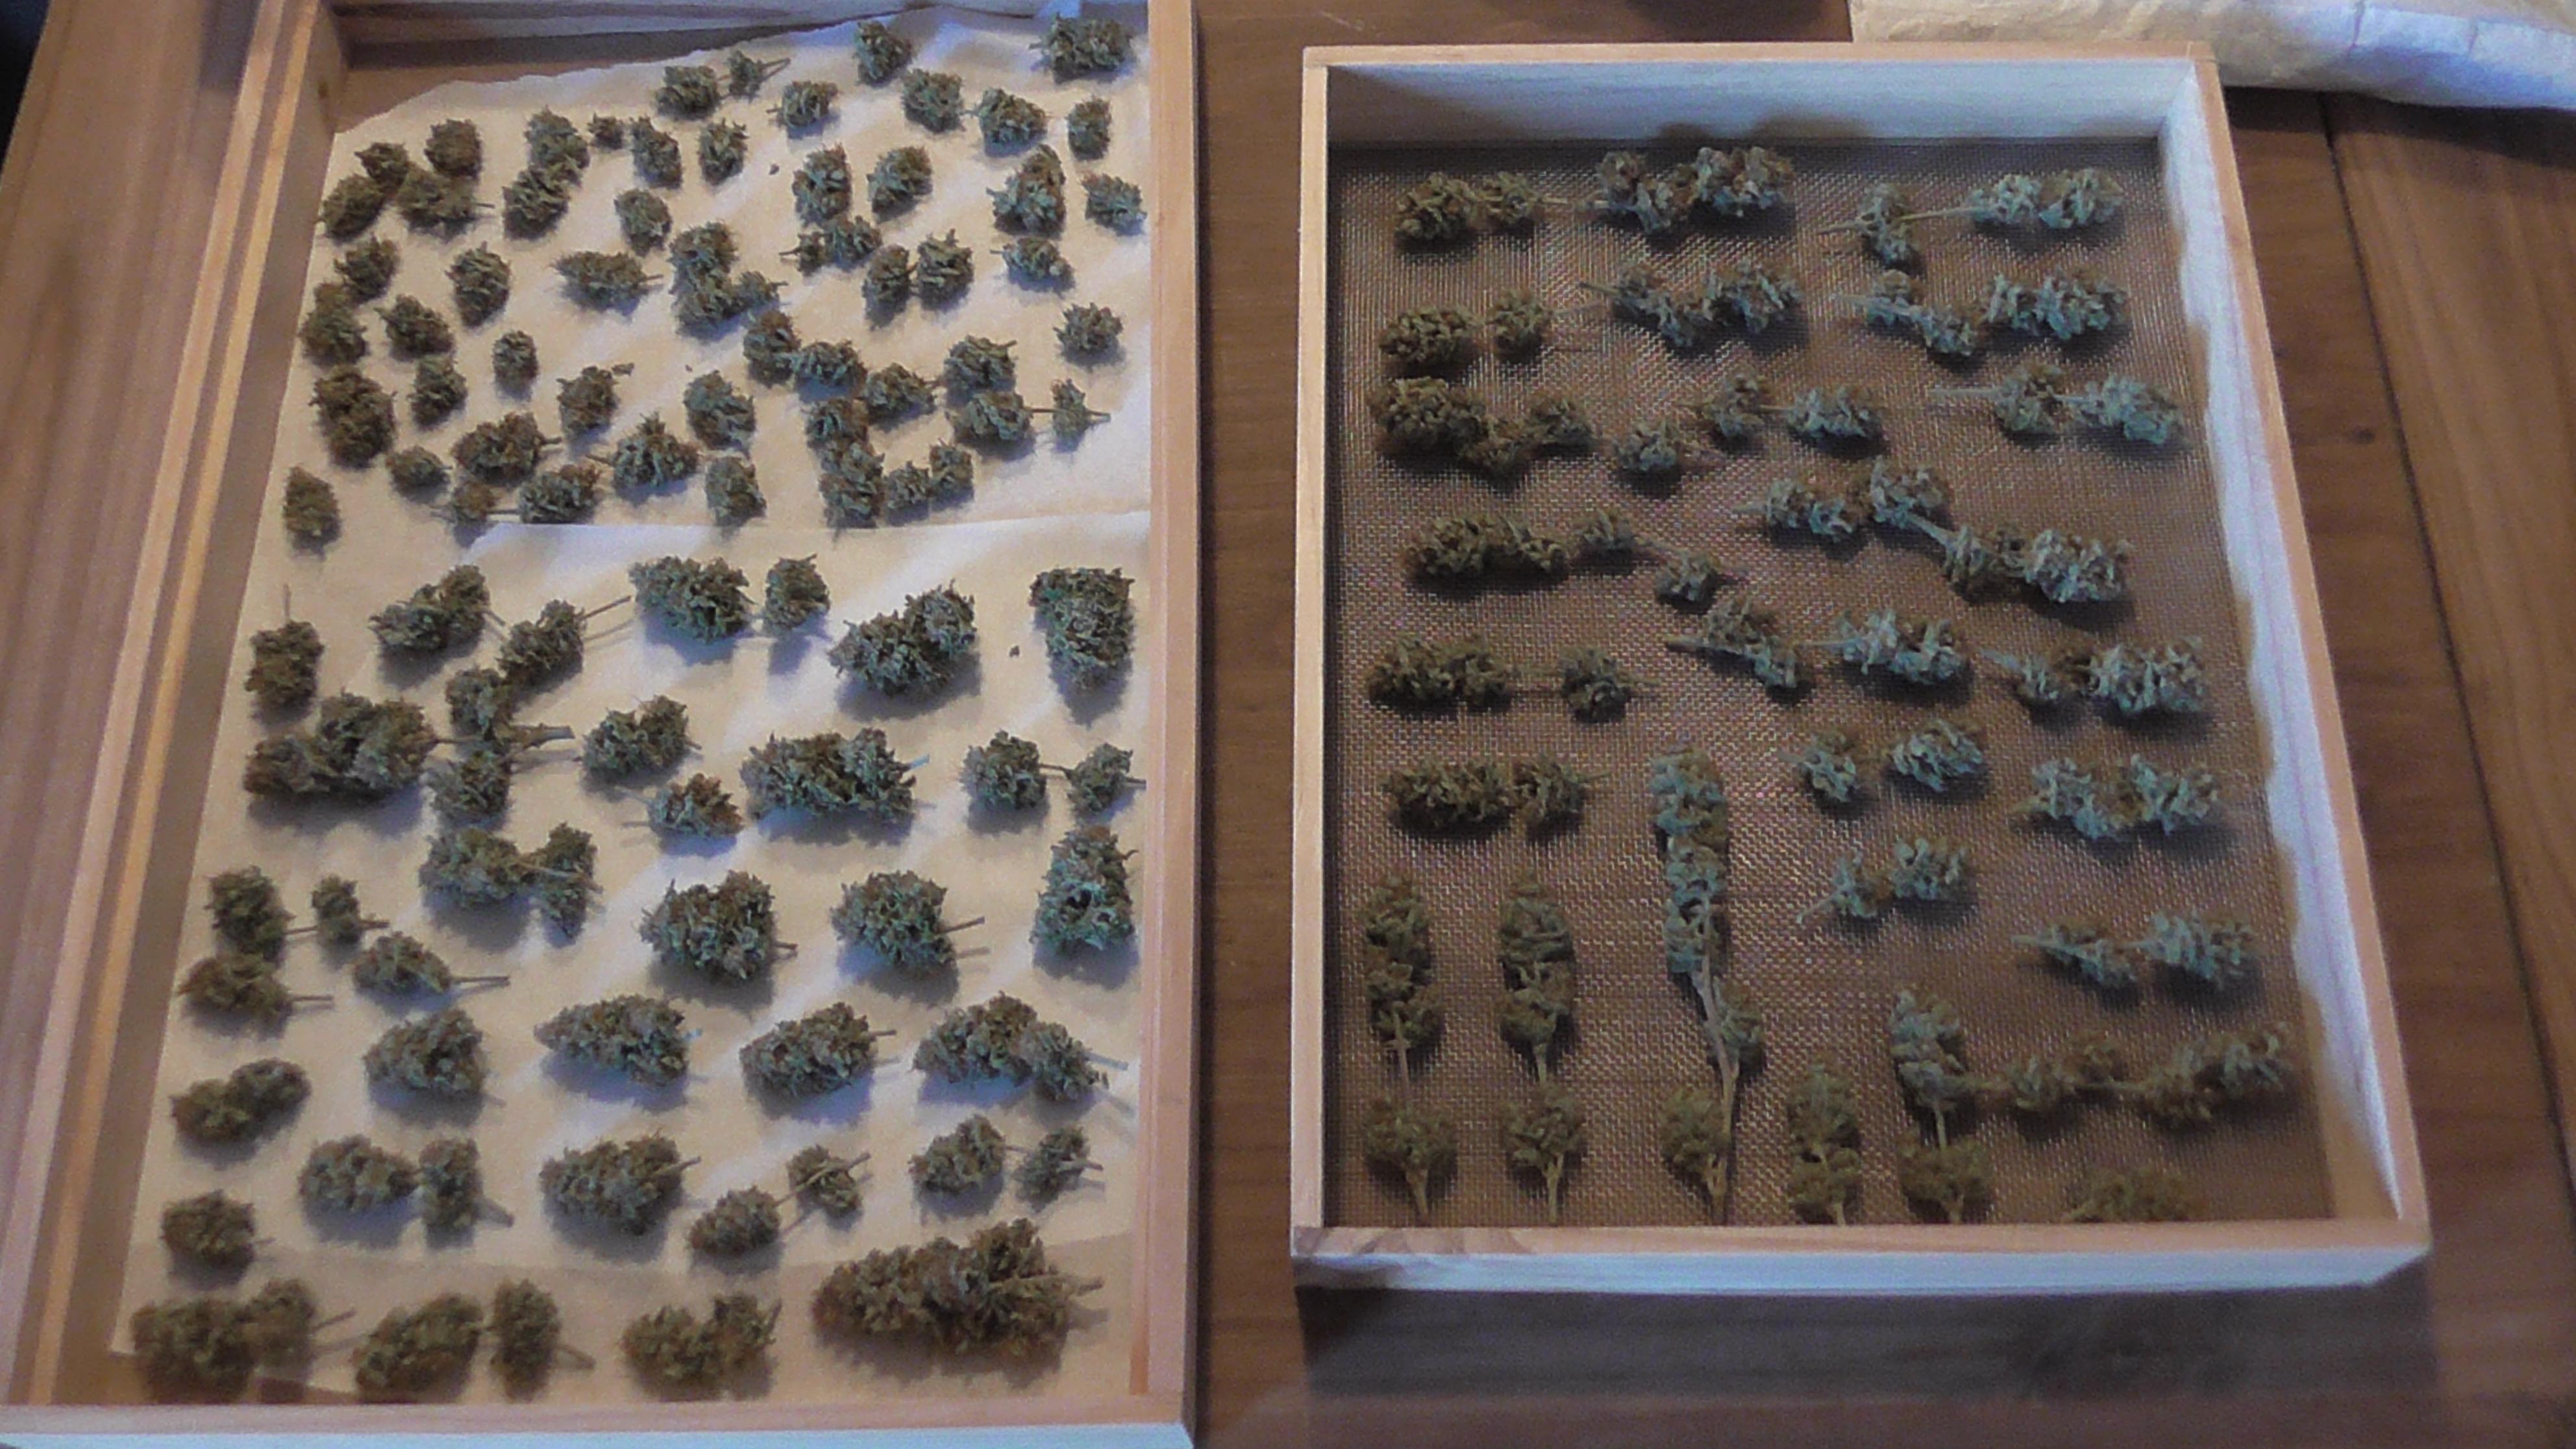 Cannabis Buds drying